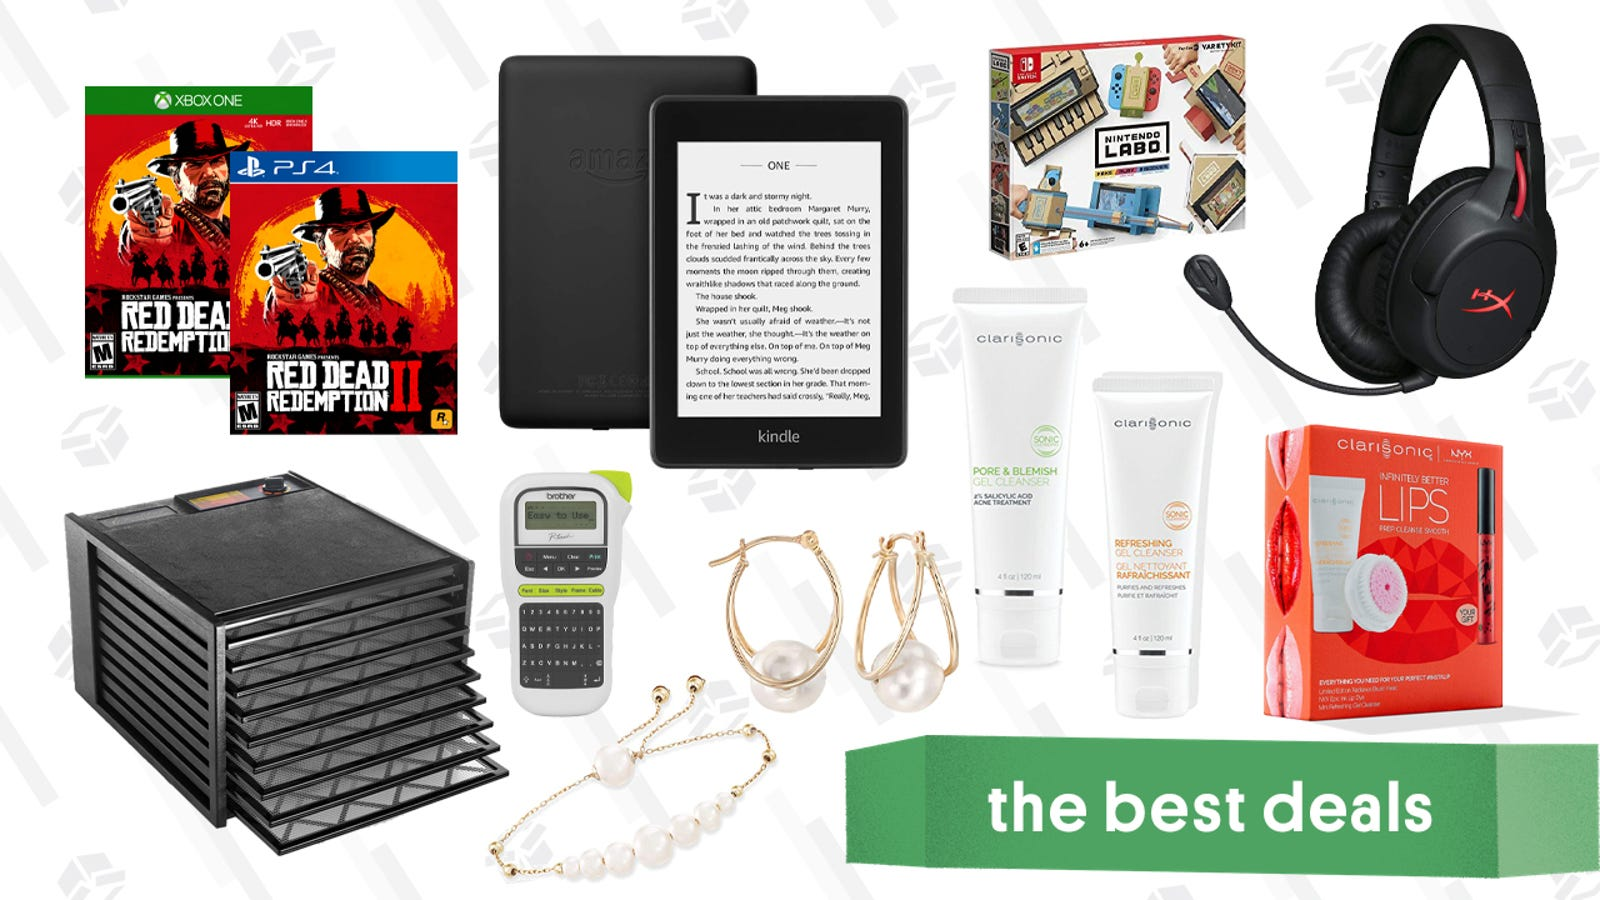 QnA VBage Sunday's Best Deals: iPads, m50xBT Headphones, Kingdom Hearts III, Clarisonic Accessories, and More